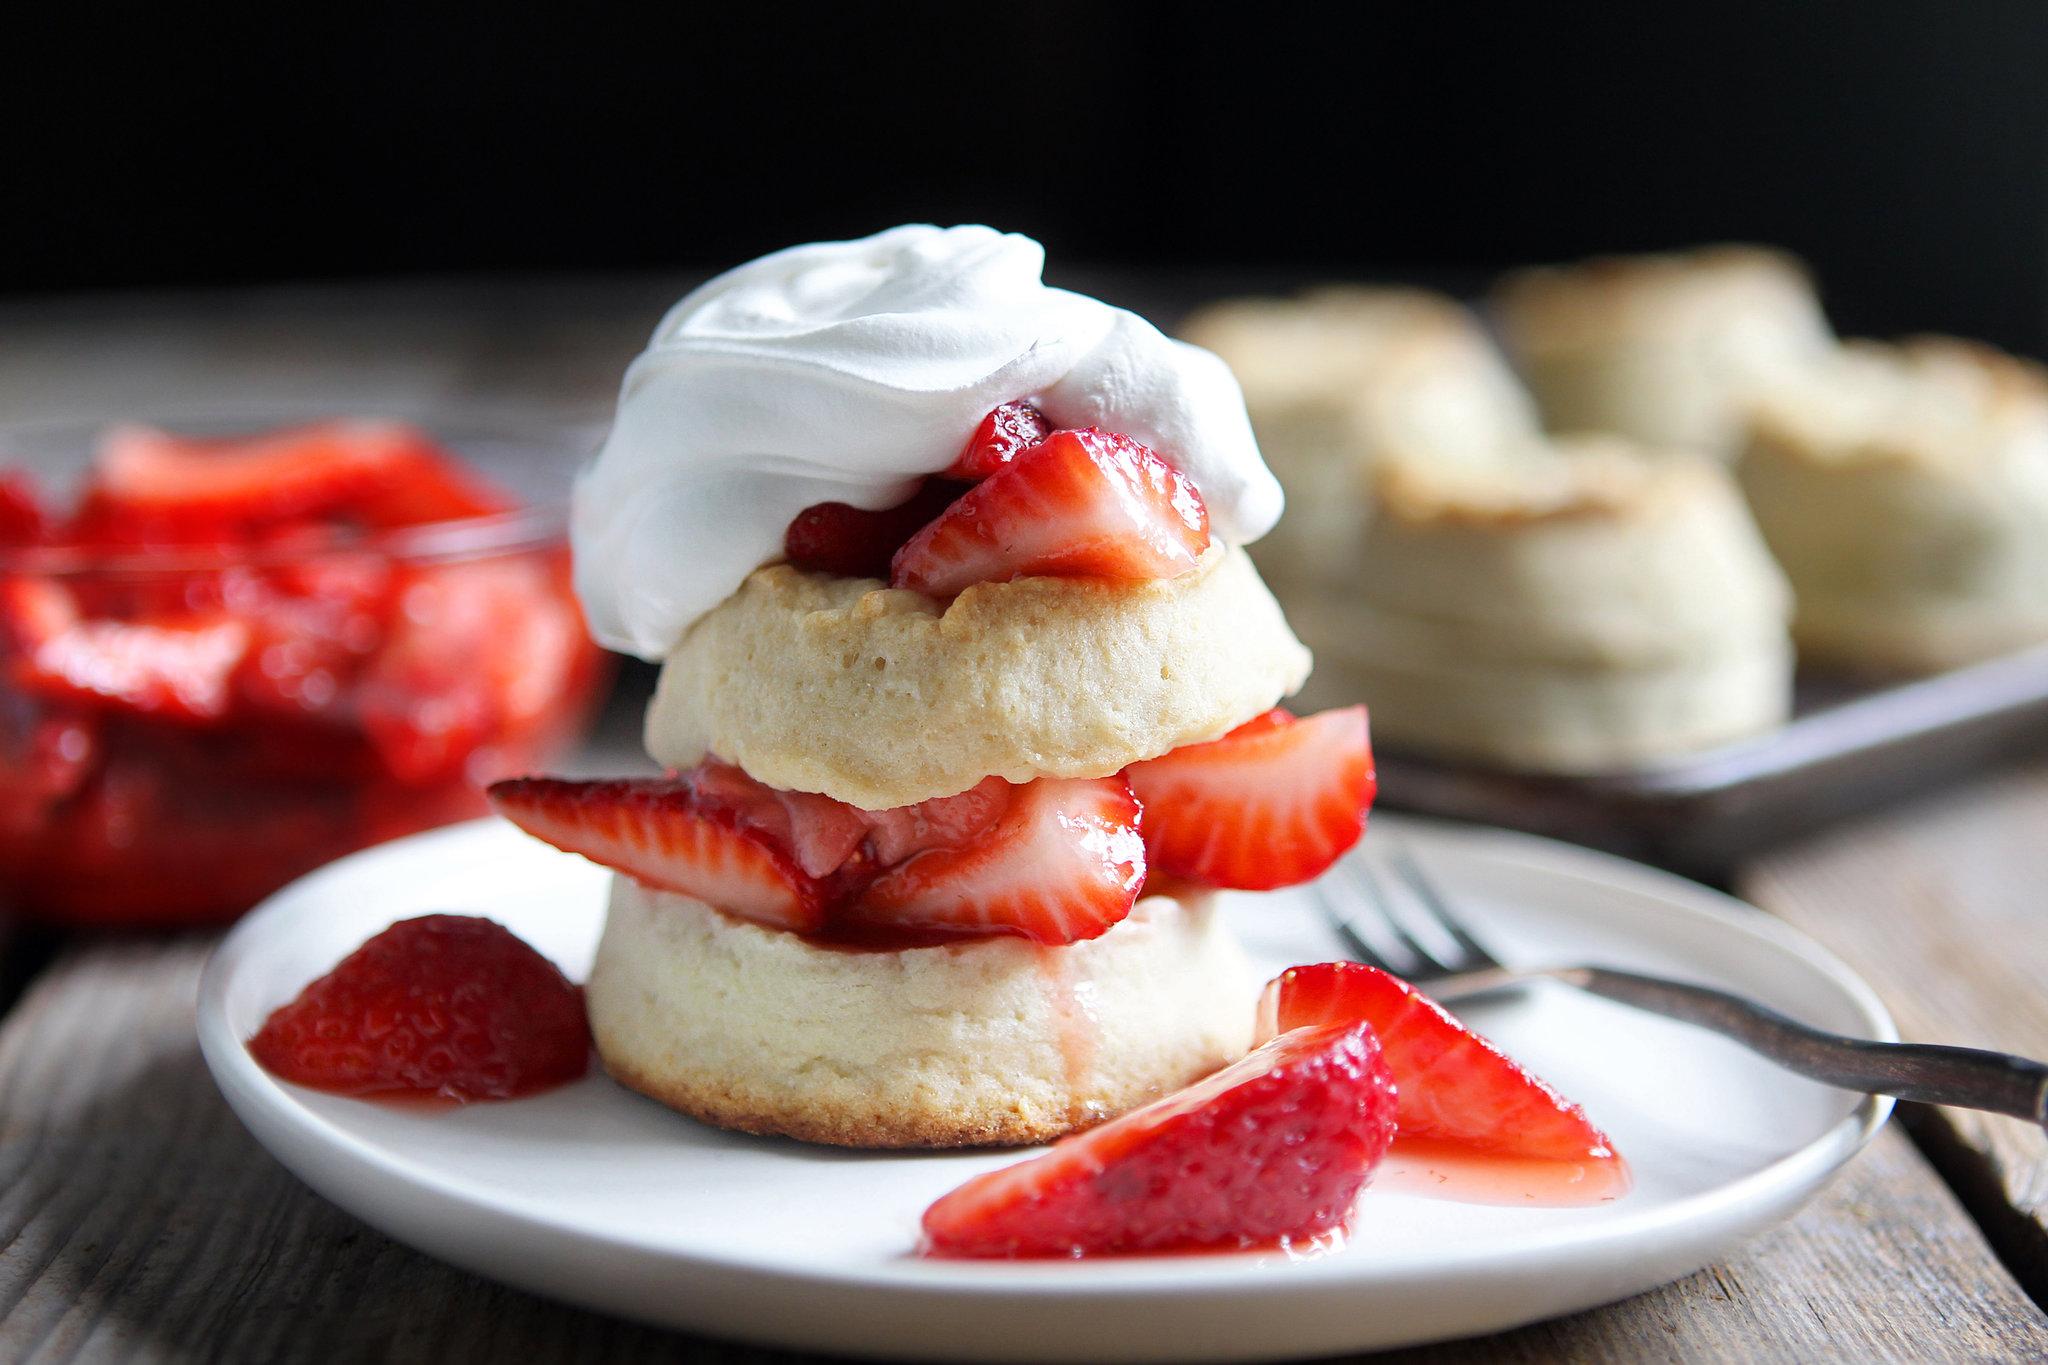 Strawberry Shortcake Backgrounds, Compatible - PC, Mobile, Gadgets| 2048x1365 px